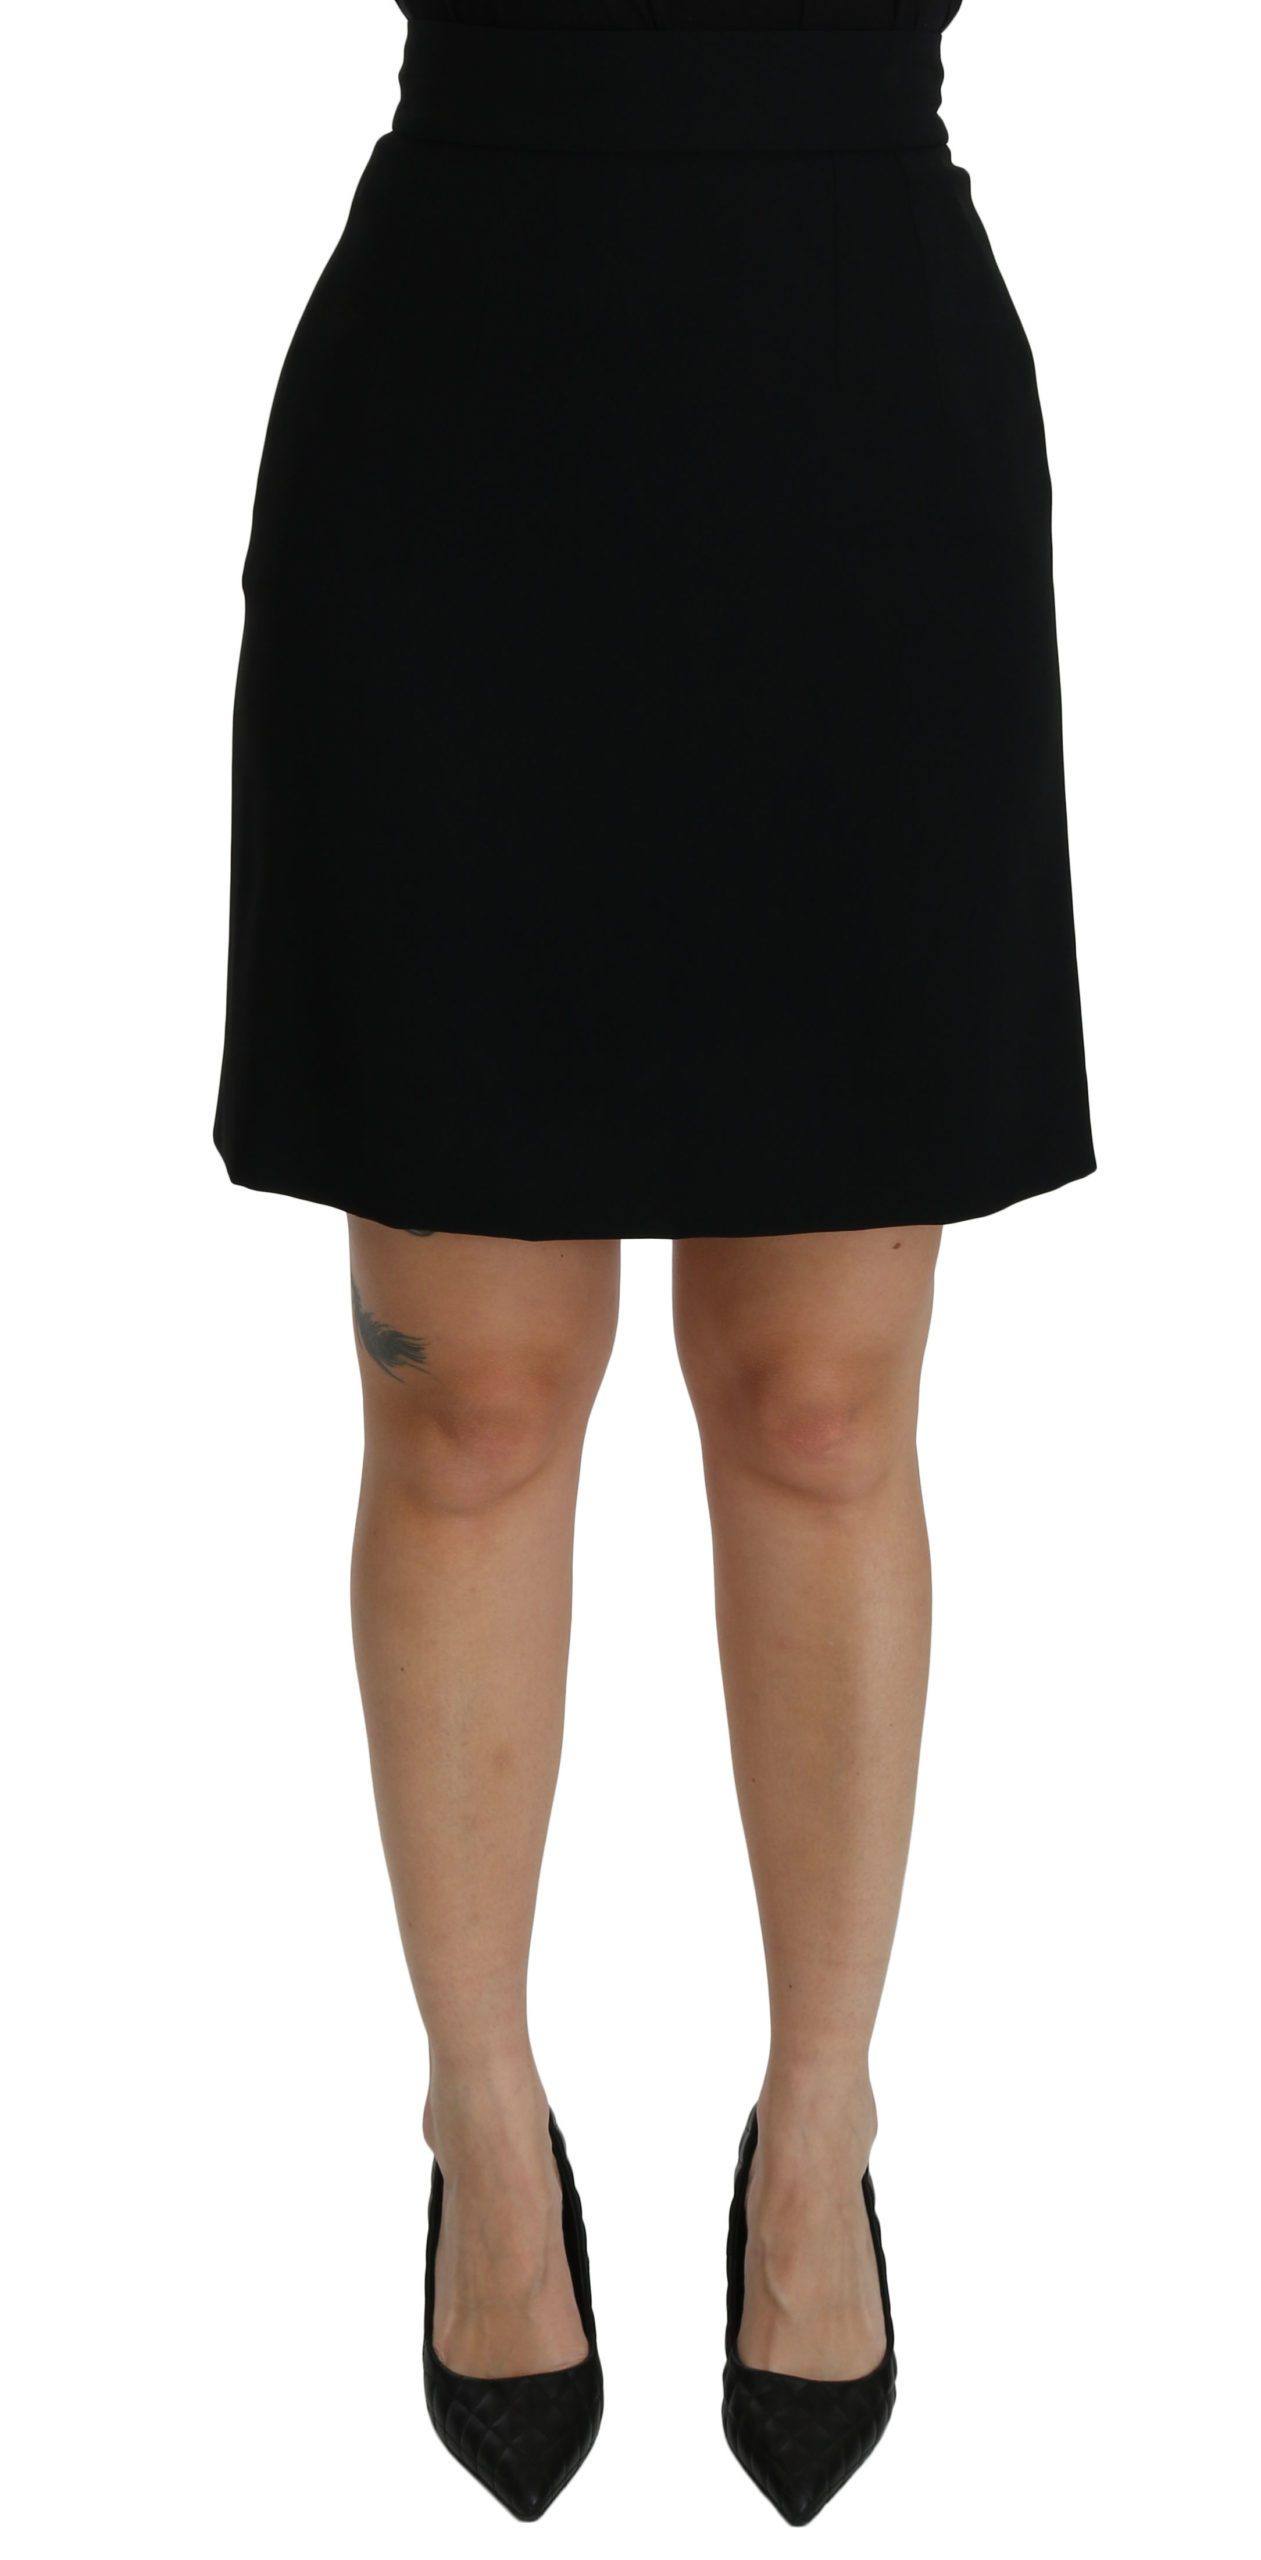 Dolce & Gabbana Women's Mermaid High Waist Midi Skirt Black SKI1388 - IT40|S